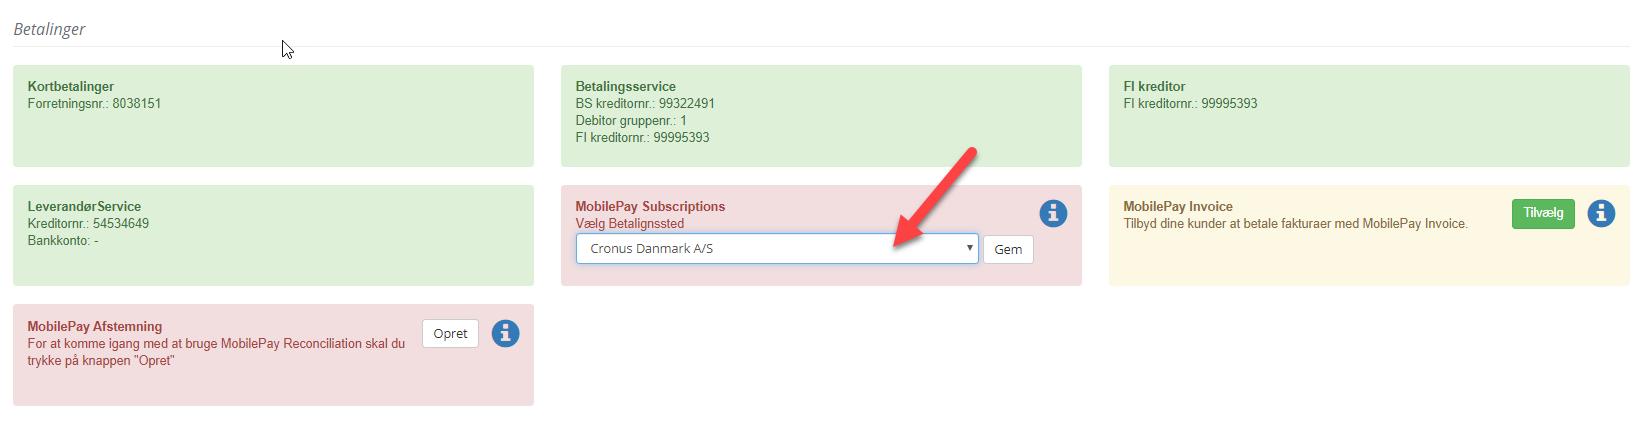 MobilePay Subscription - Flere betalingssteder